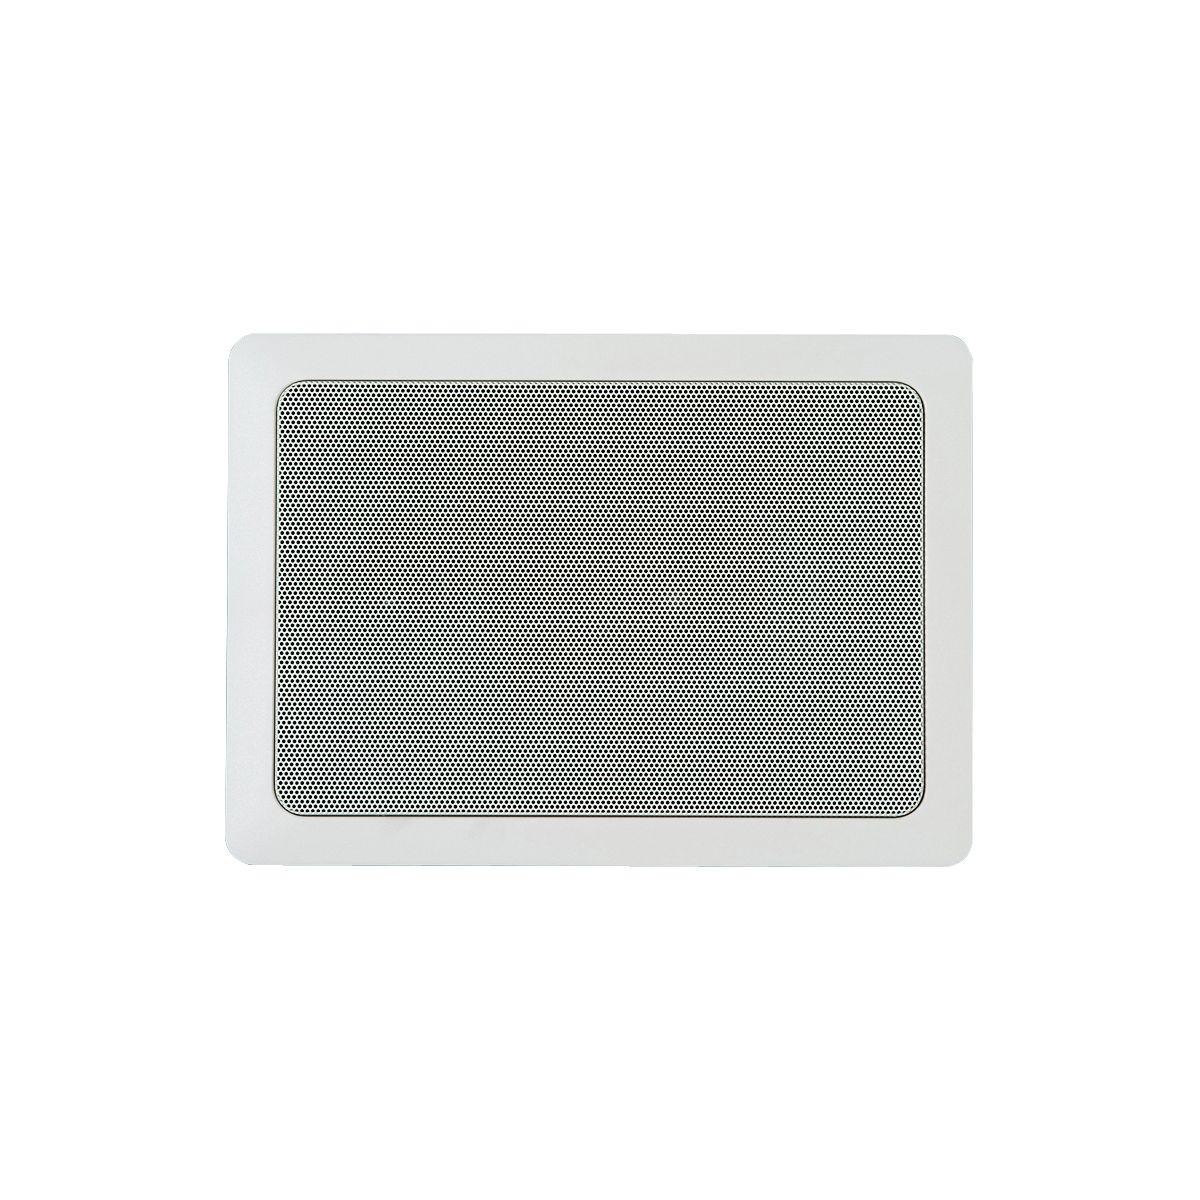 Enceinte encastrable DAVIS 100 RE Blanc (photo)